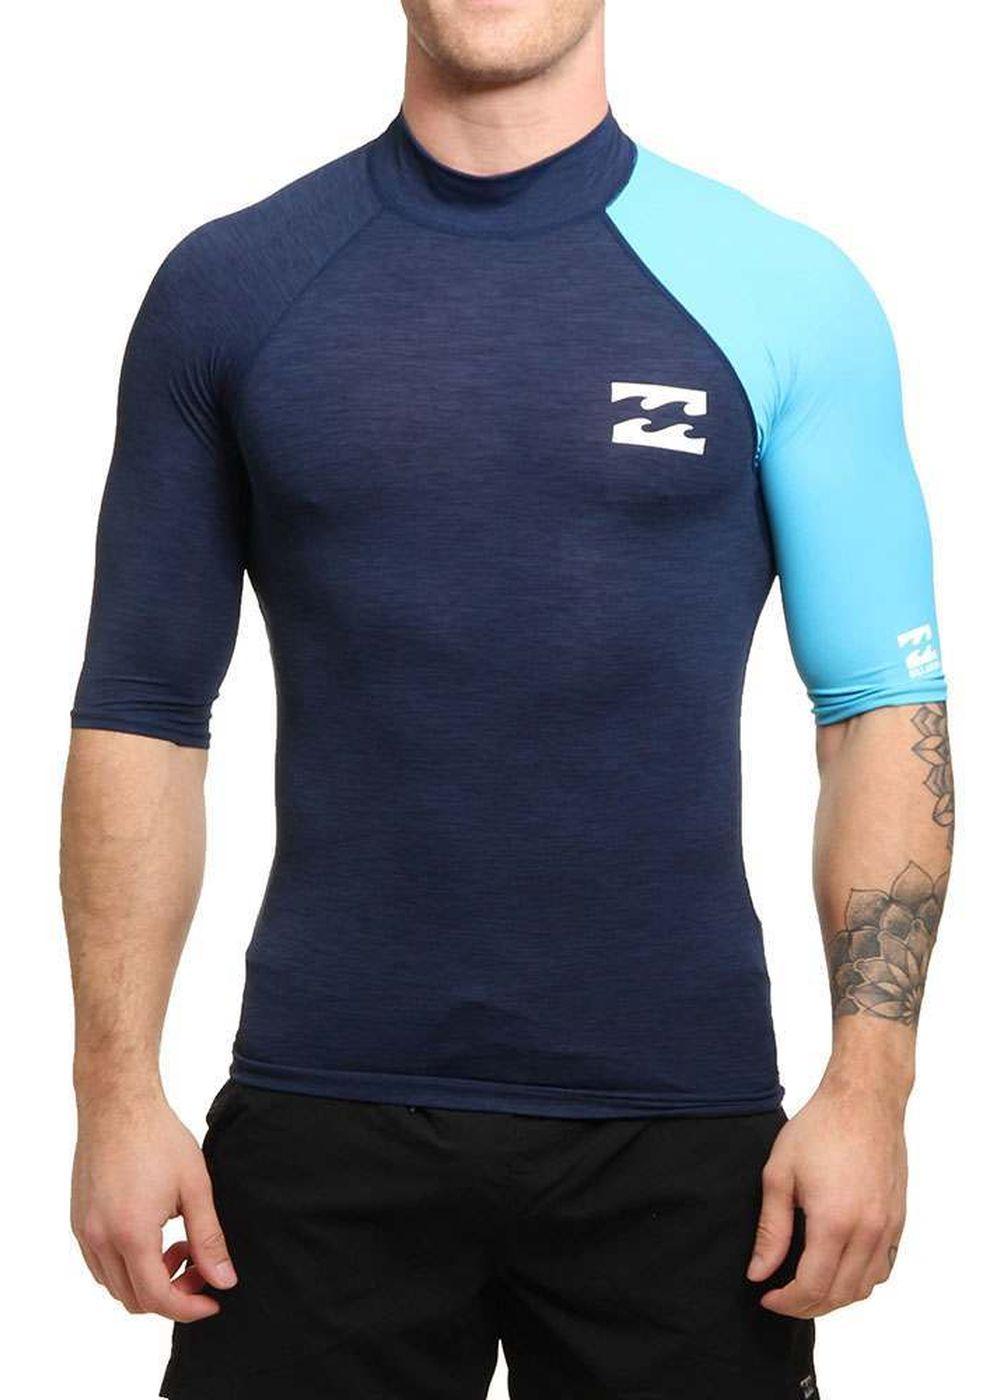 Billabong Contrast Short Sleeve Rash Vest Navy Picture